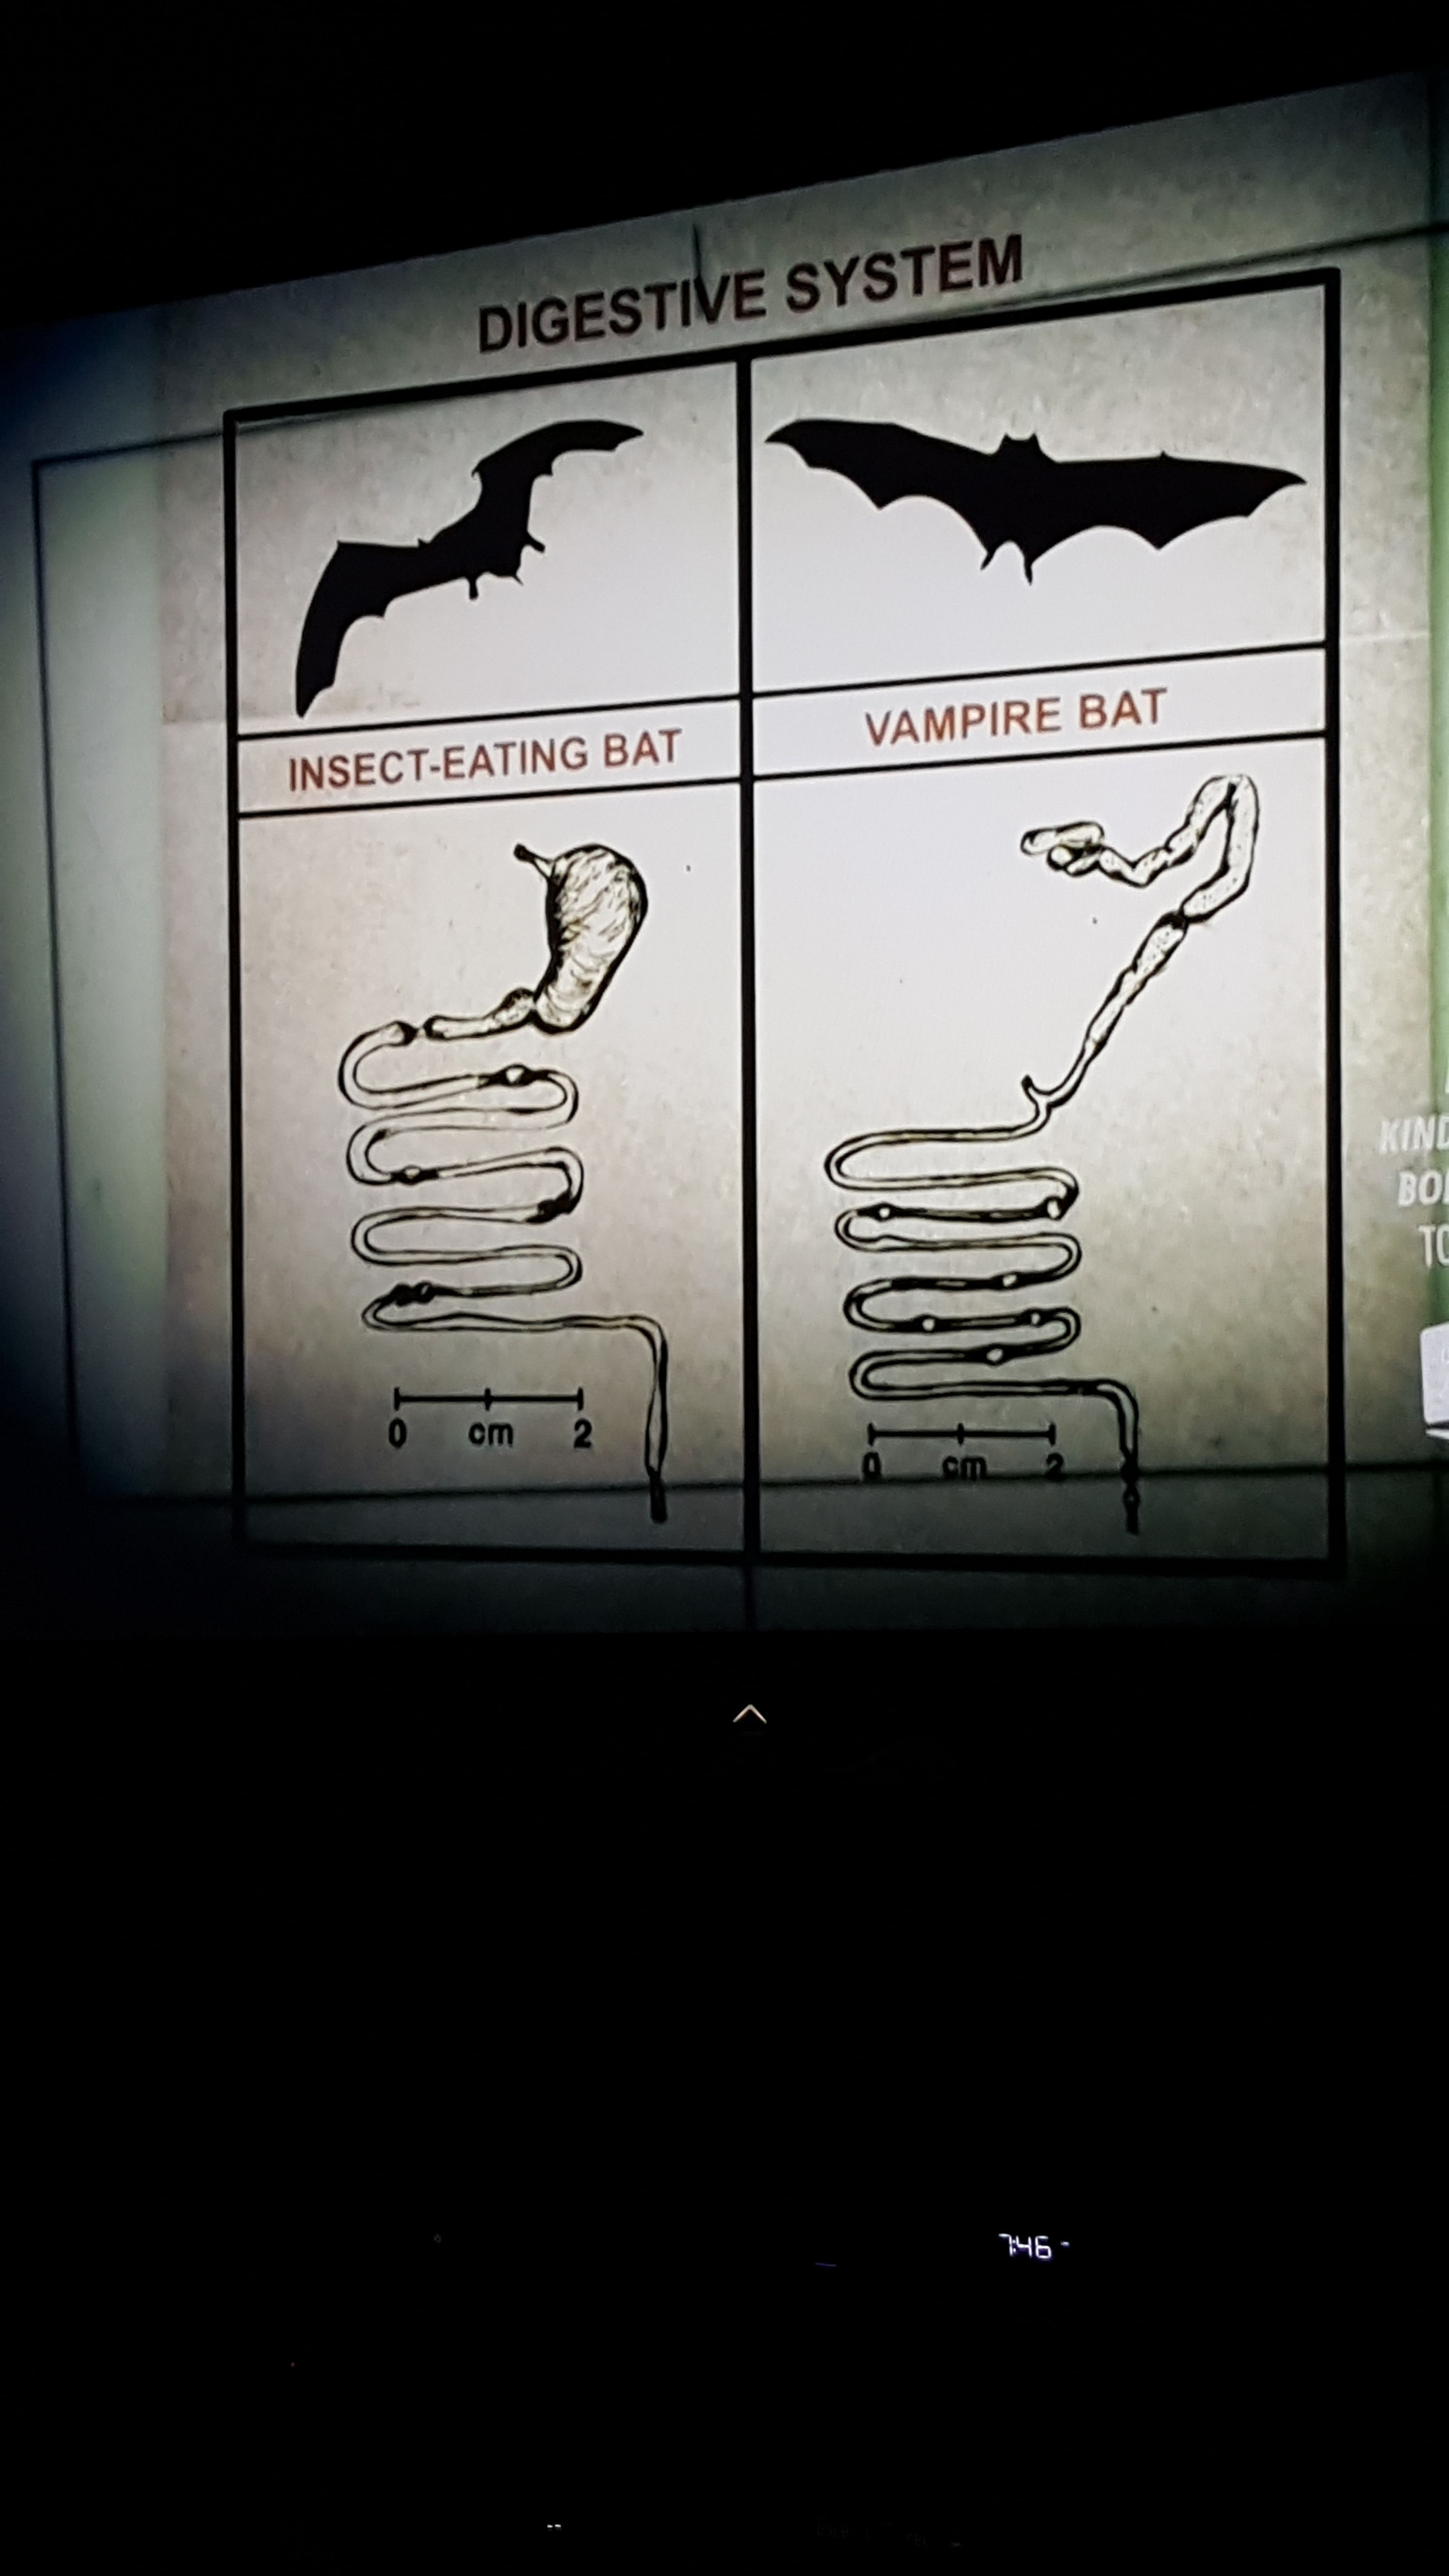 Digestive System Of Insect Eating Bat Vs Vampire Bat